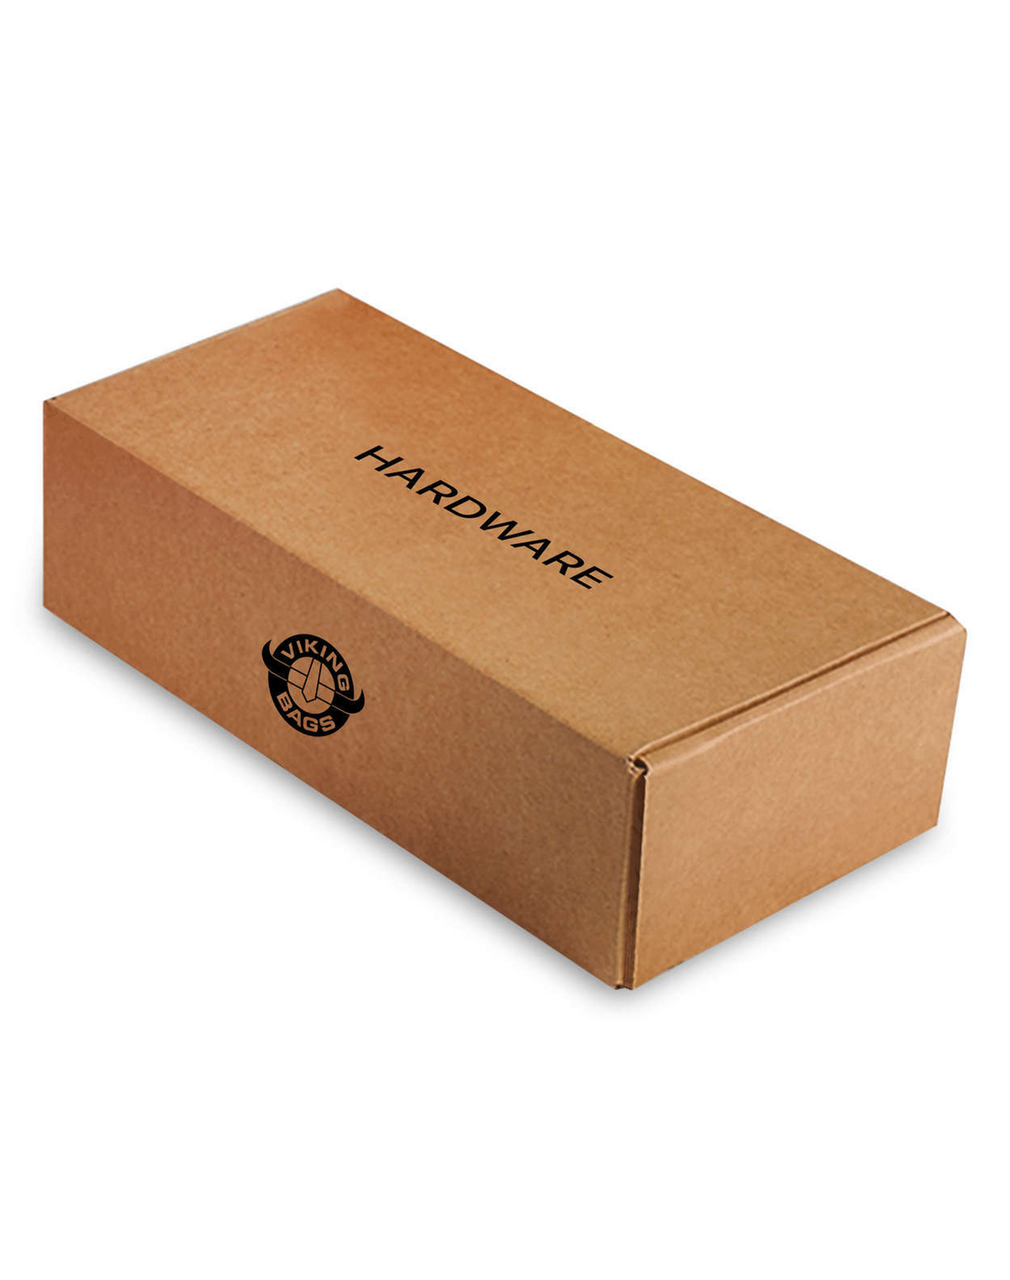 Honda VTX 1800 R (Retro) Viking Lamellar Extra Large Shock Cutout Leather Covered Saddlebag Hardware Box